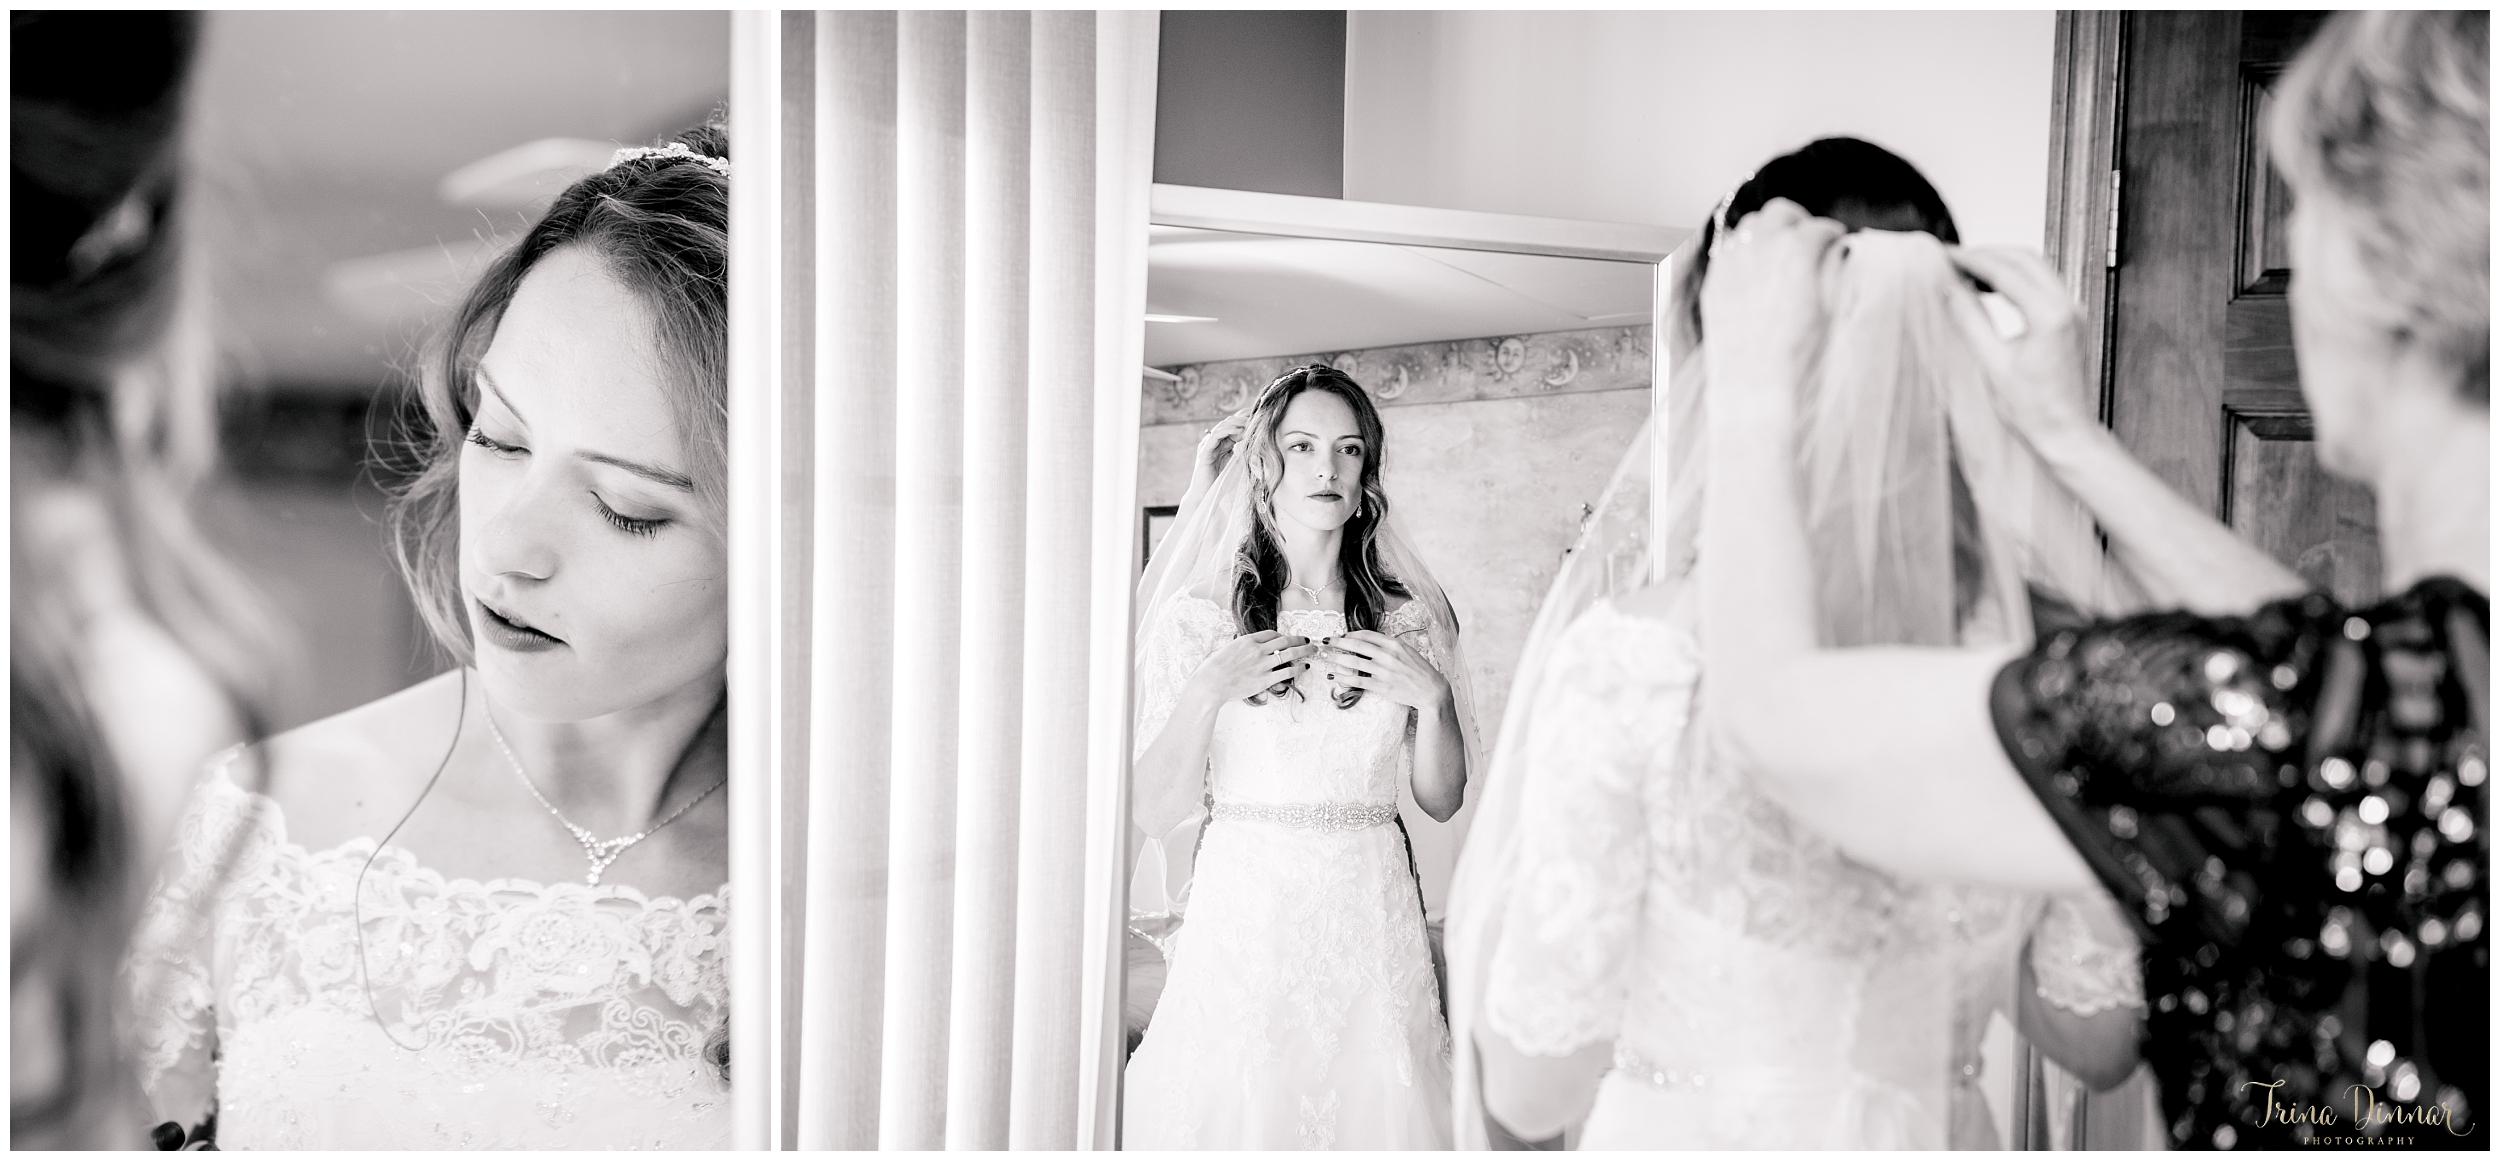 Bride gets ready for her Seaside Wedding in Biddeford Pool, Maine